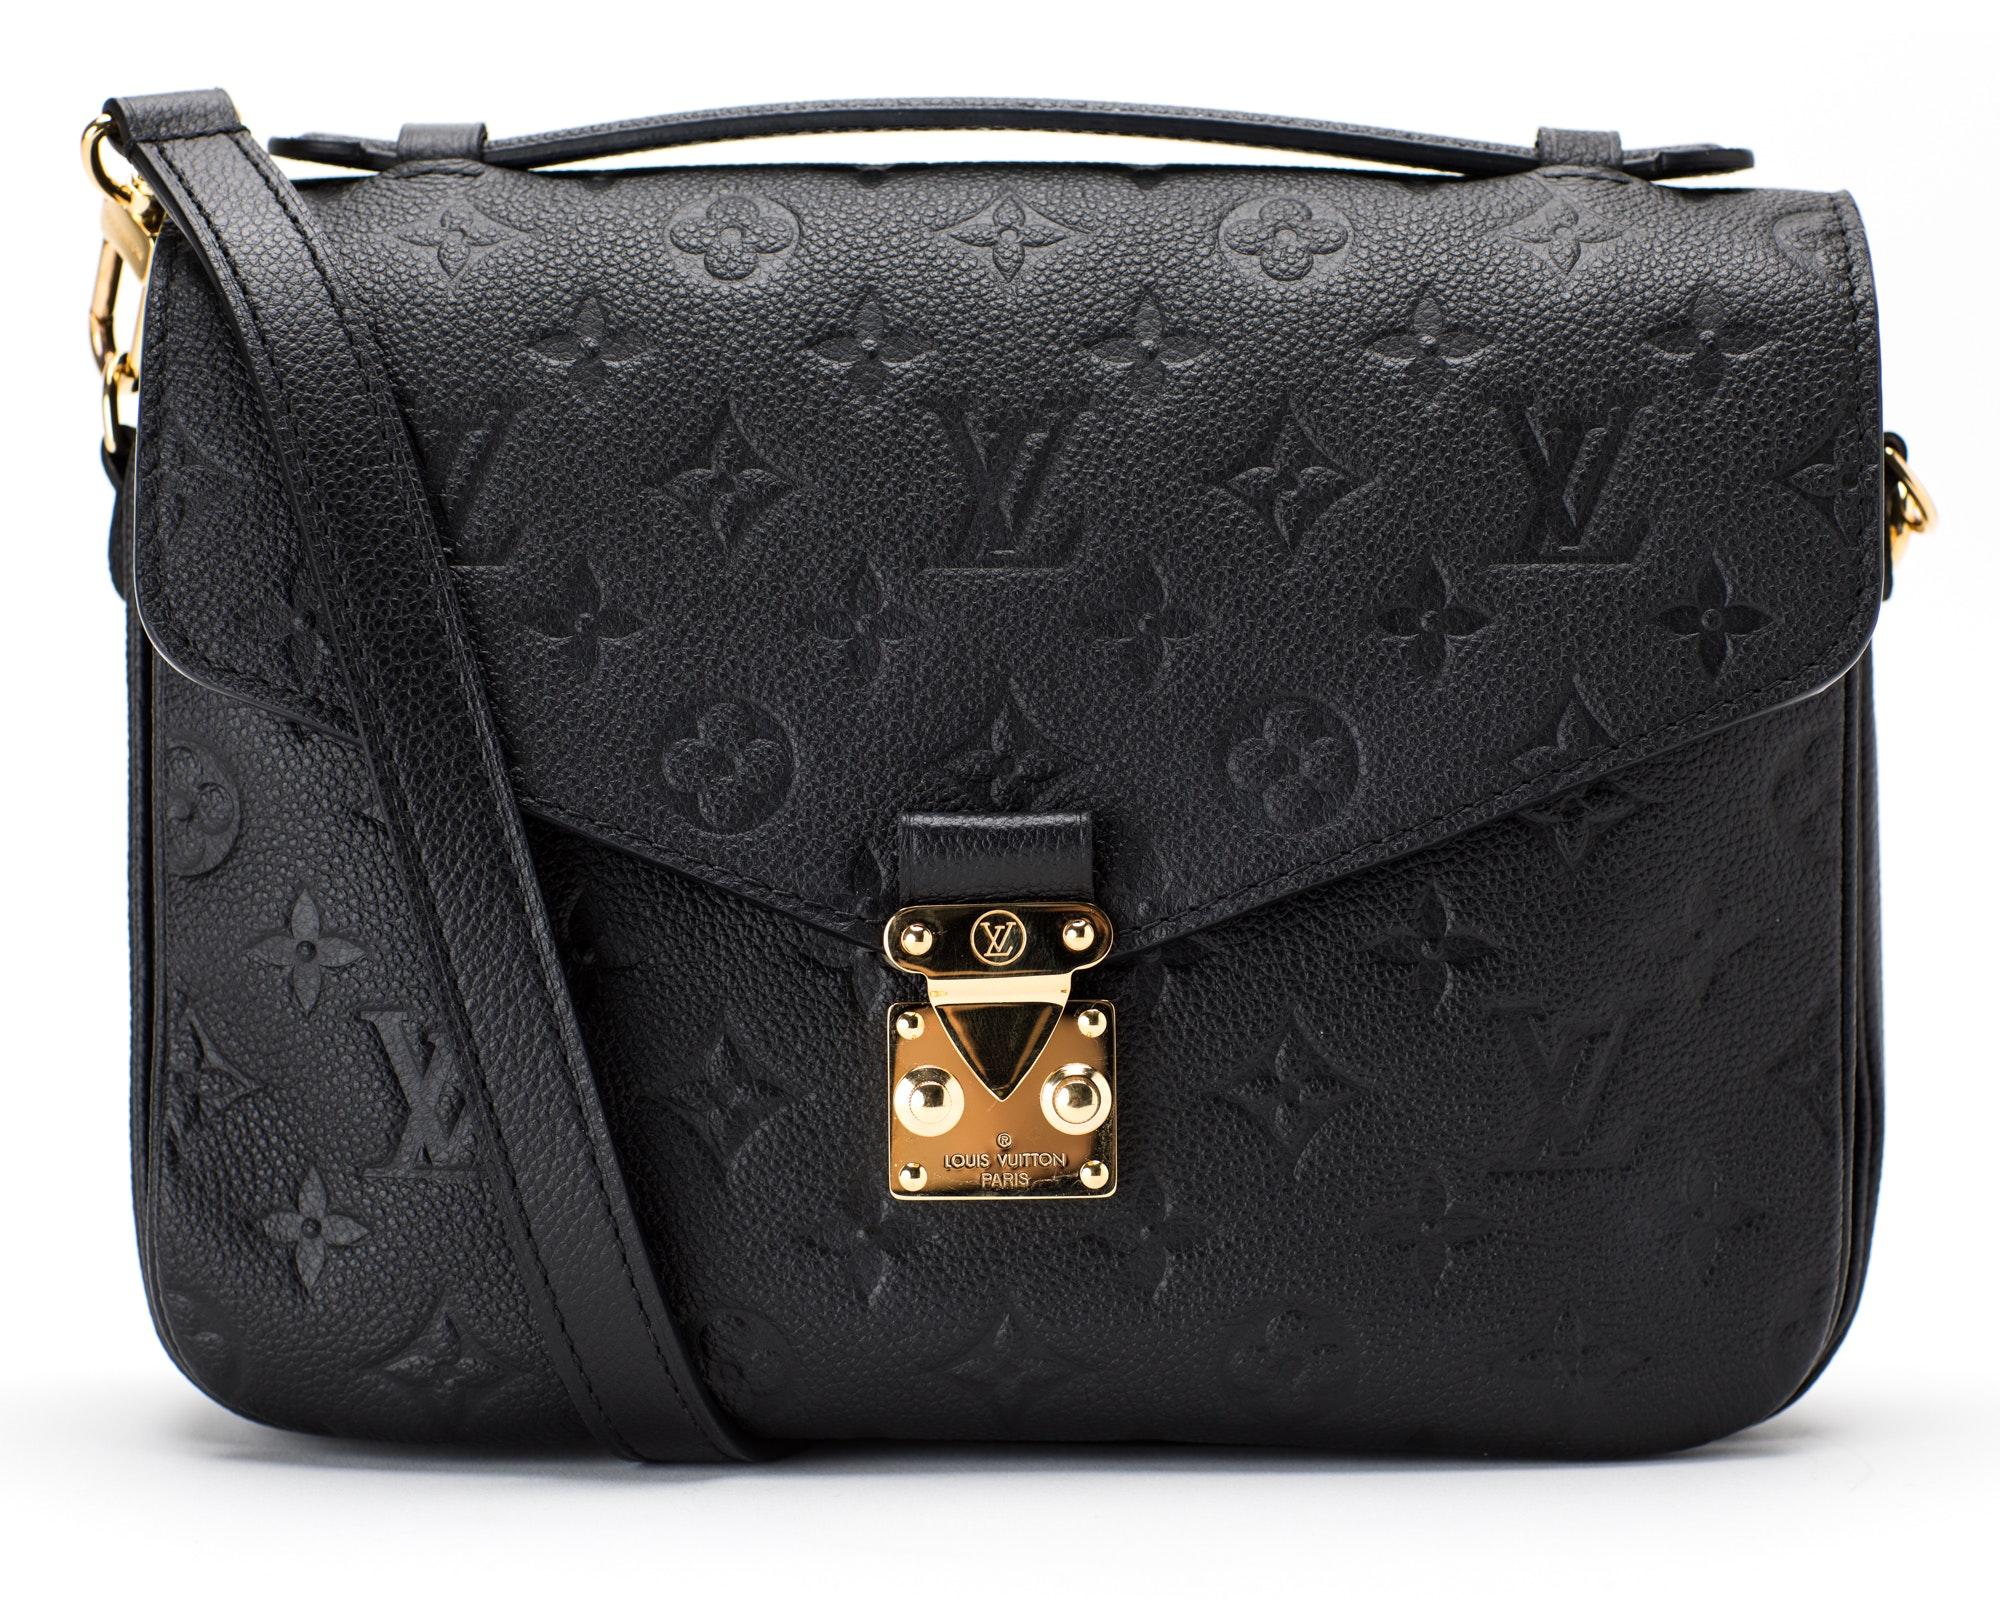 Louis Vuitton Metis Pochette Empreinte Noir